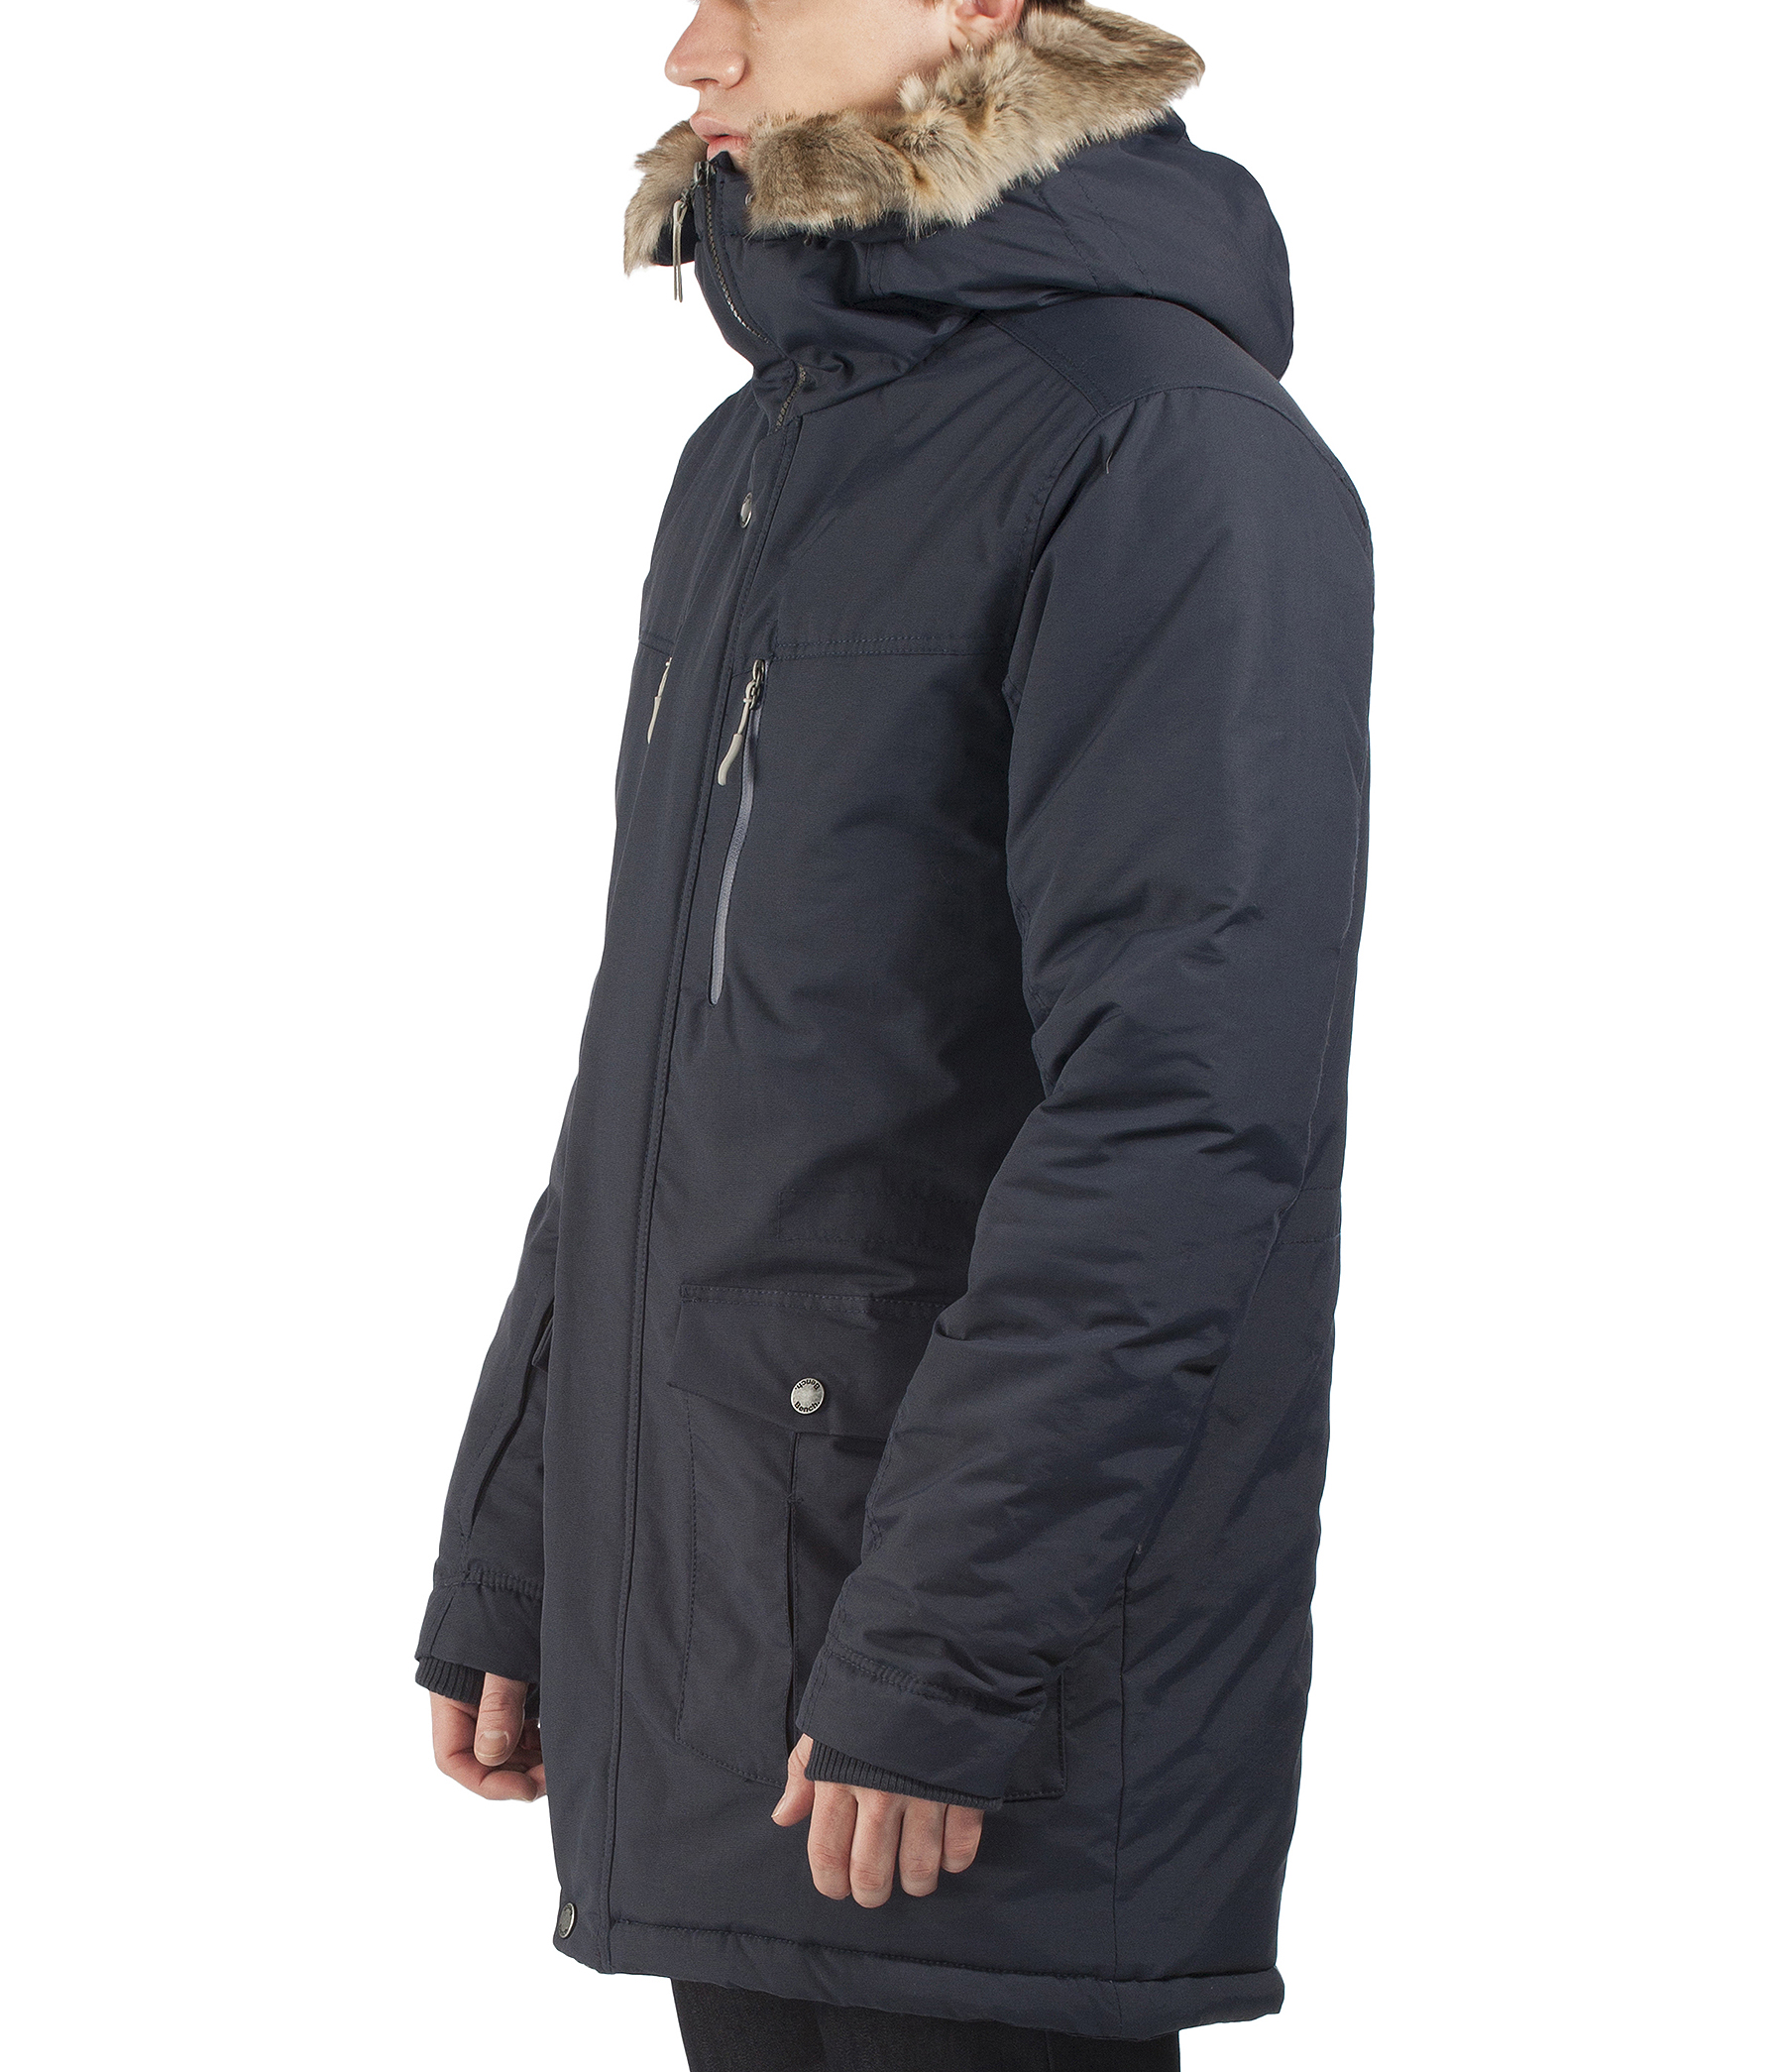 Bench parka jacket